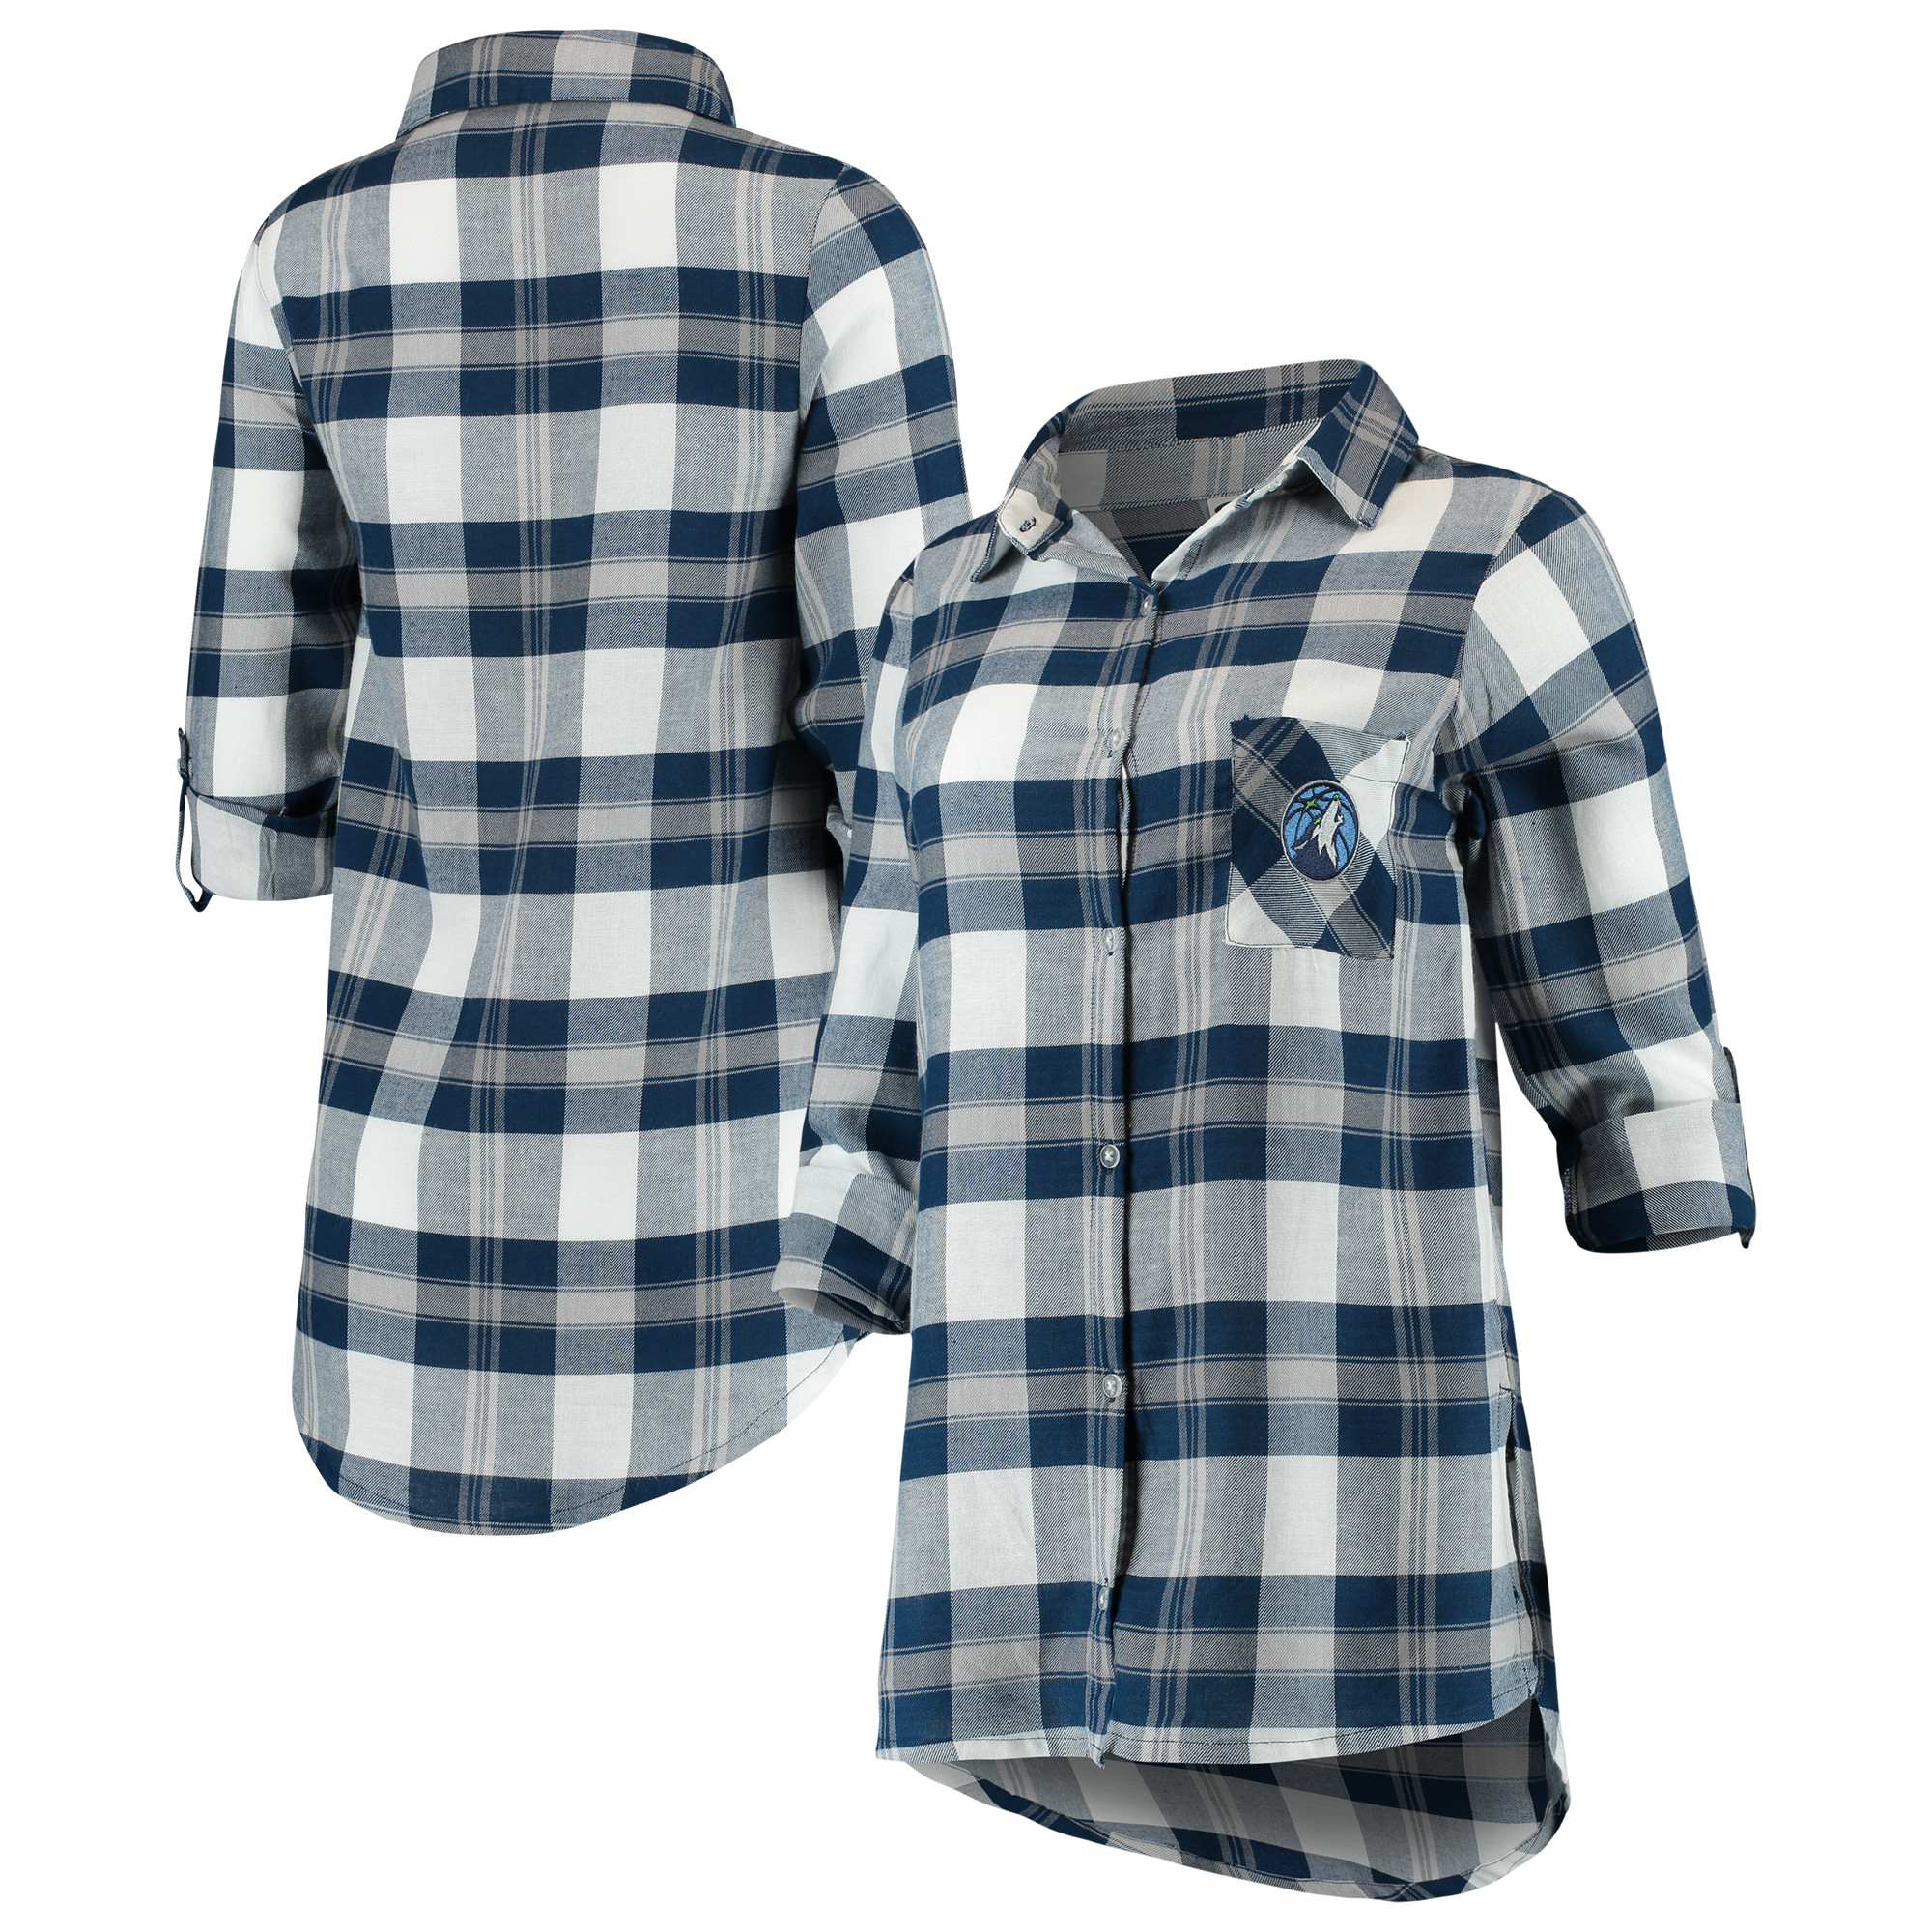 Minnesota Timberwolves Concepts Sport Women's Headway Long Sleeve Plaid Tunic - Navy/Gray